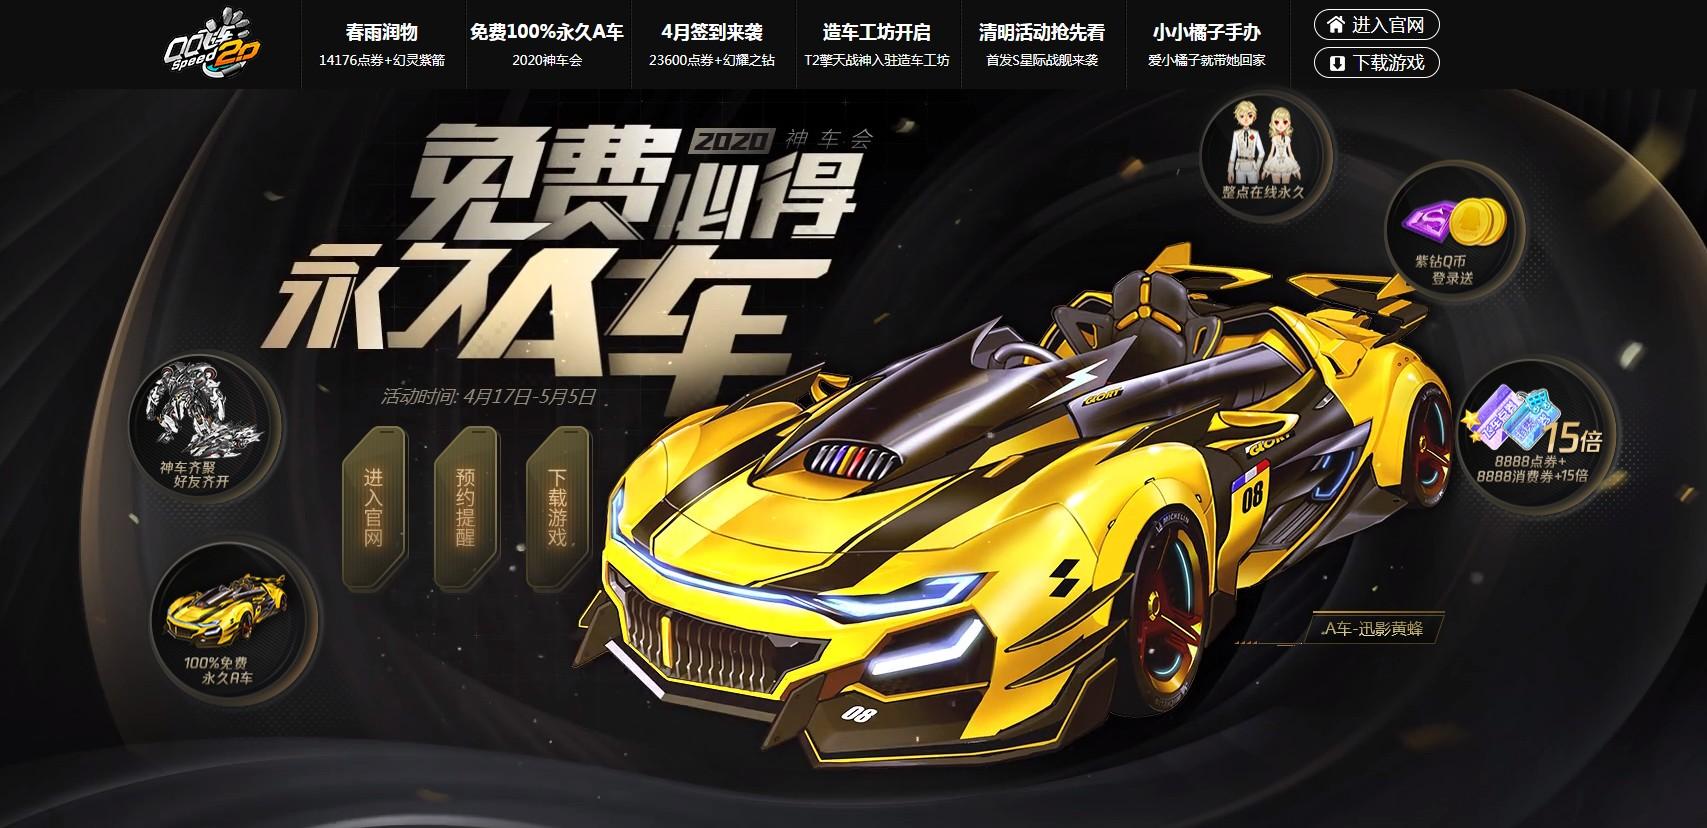 QQ飞车5.1活动大全活动 整点在线必得A车 迅影黄蜂 30天/永久 颜夕卡盟